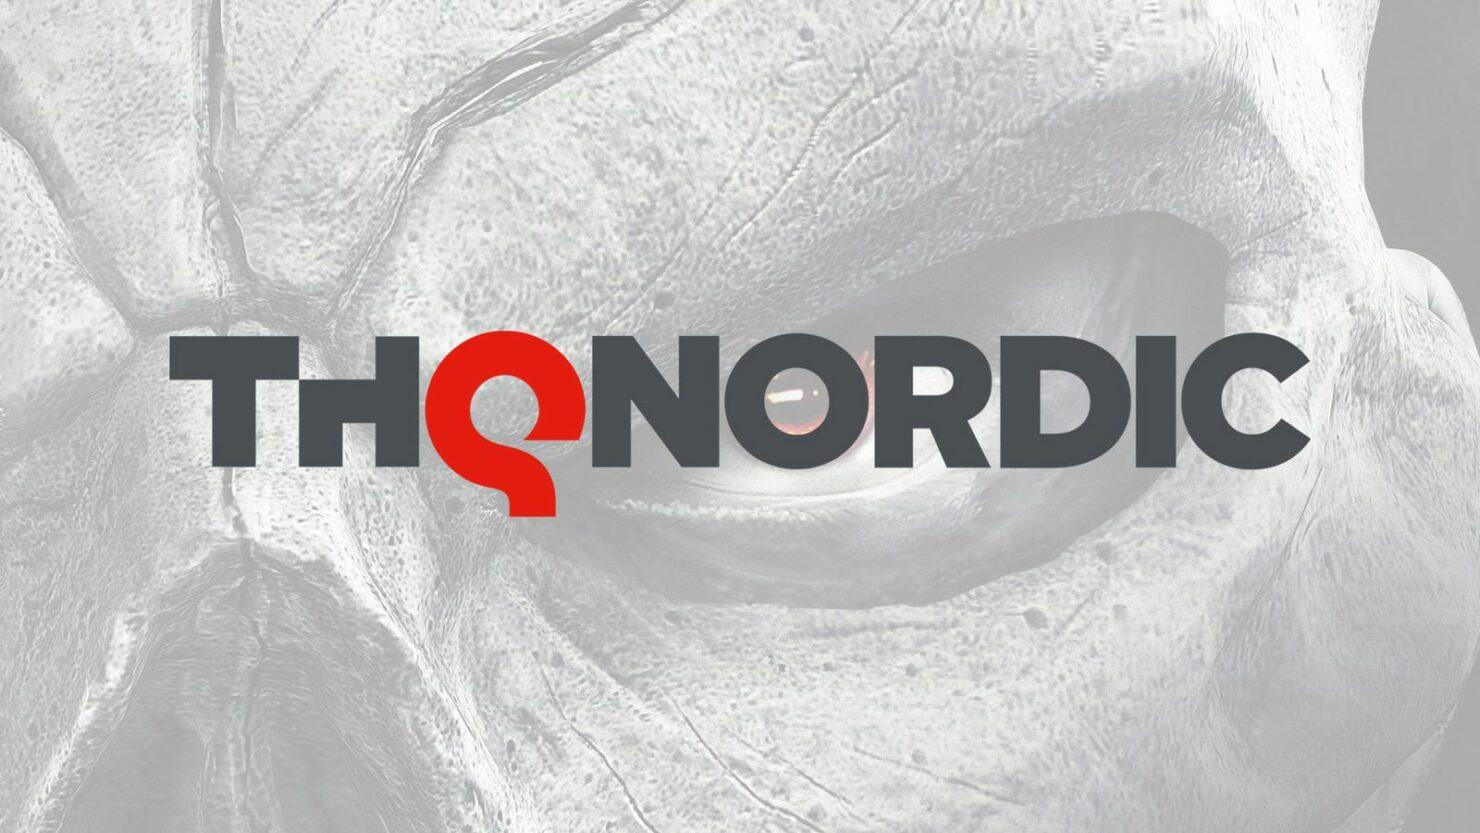 thq nordic koch media deep silver